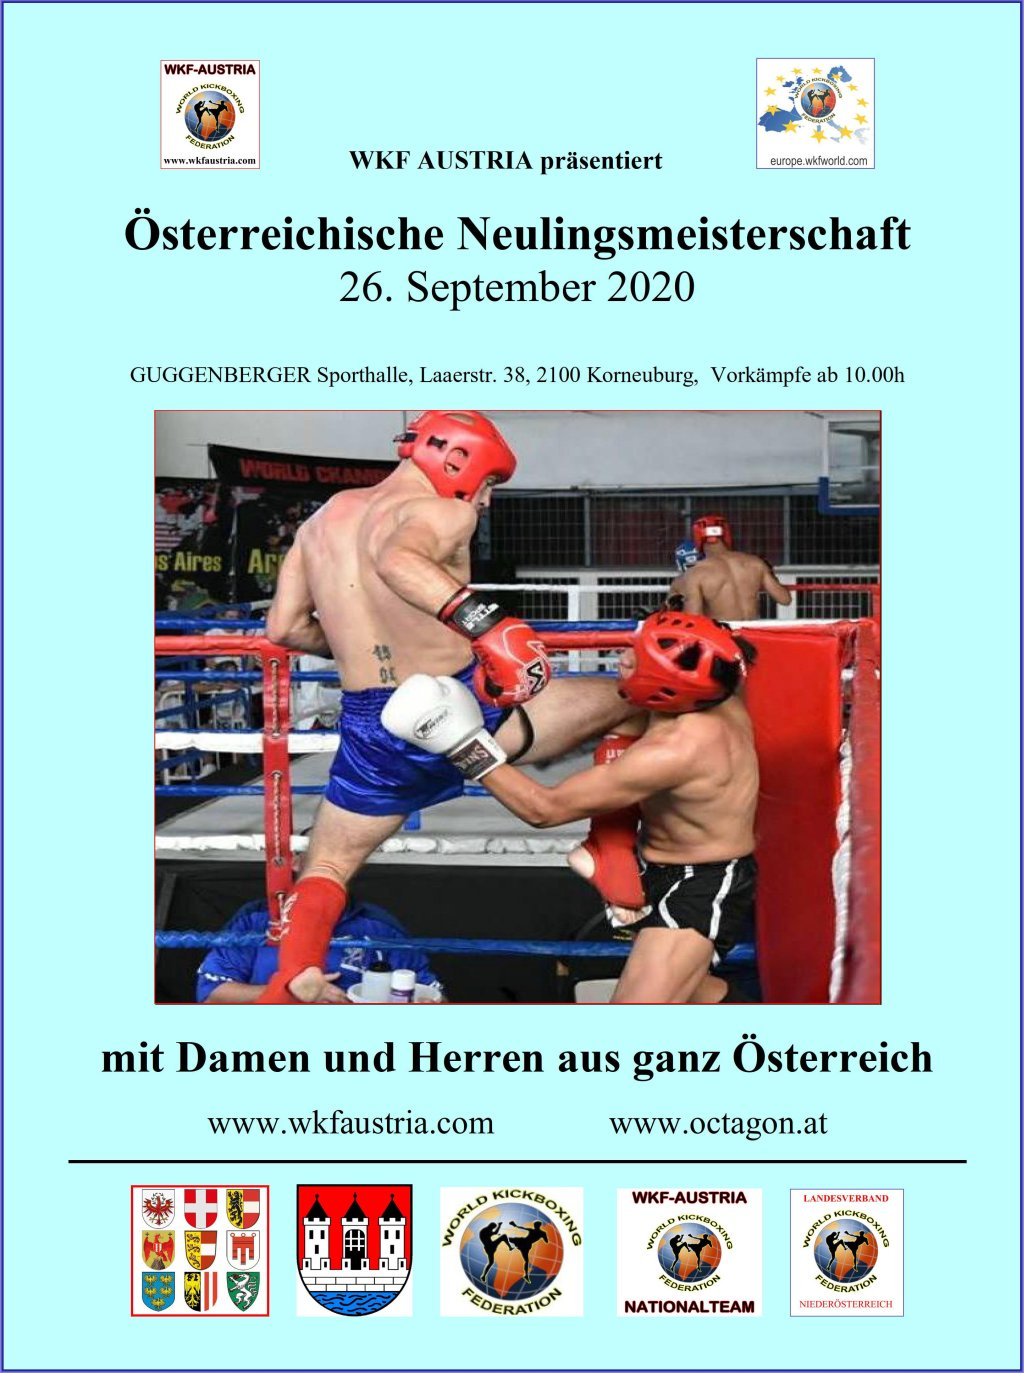 WKF Austria präsentiert Österreichische Neulingsmeisterschaft am 26. September 2020